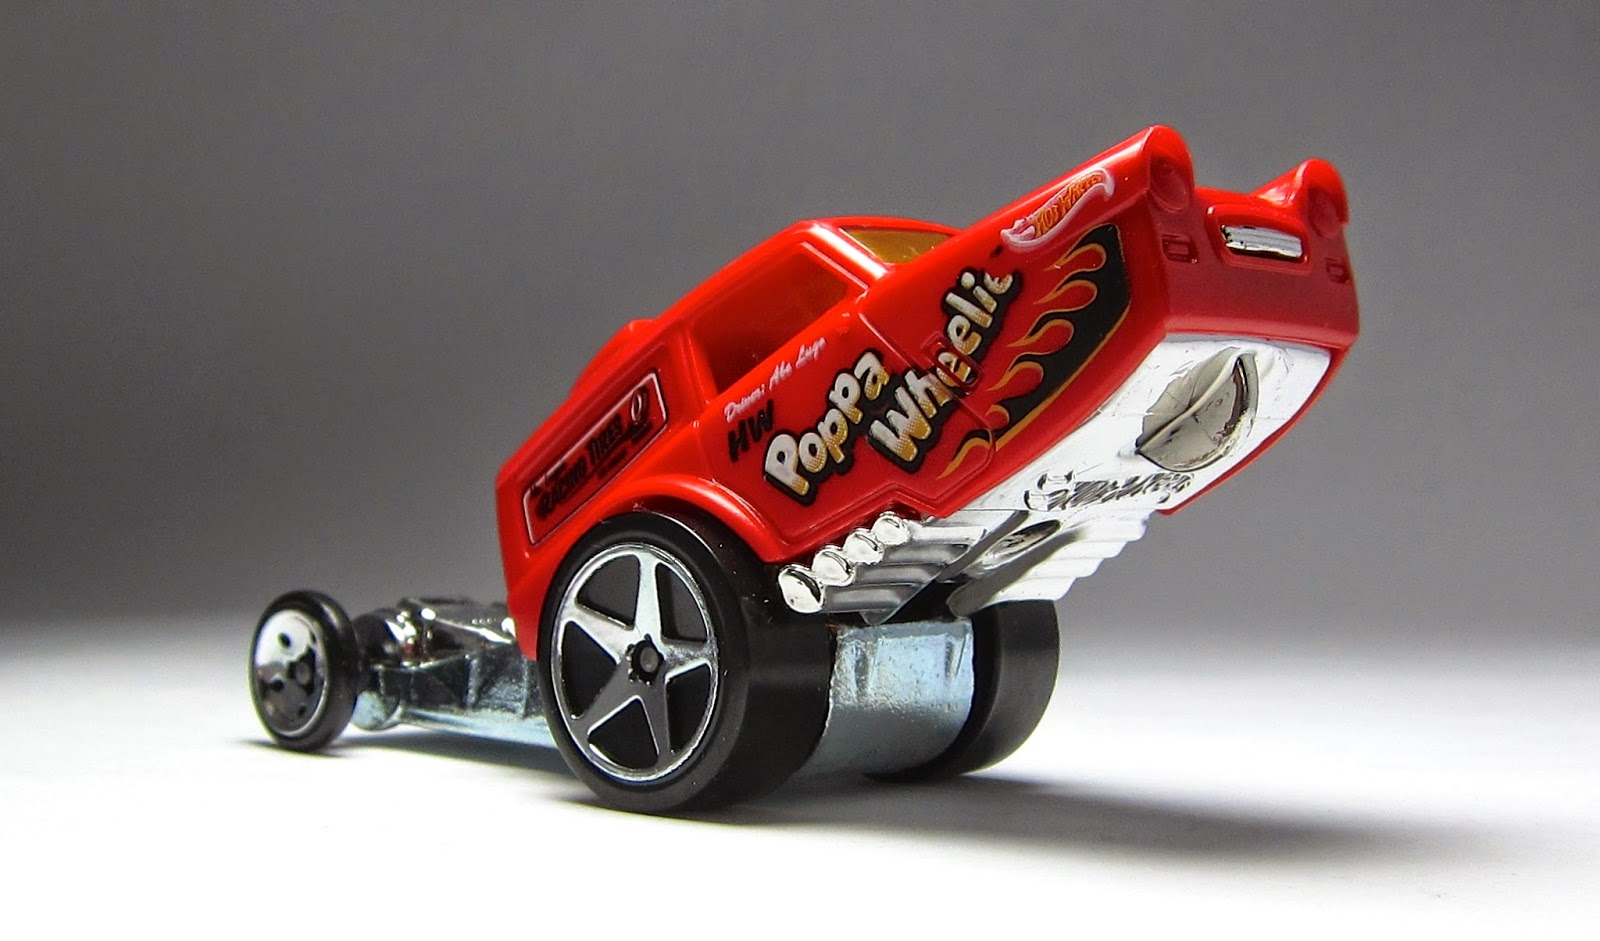 hot wheels poppa wheelie 2014 new models - Rare Hot Wheels Cars List